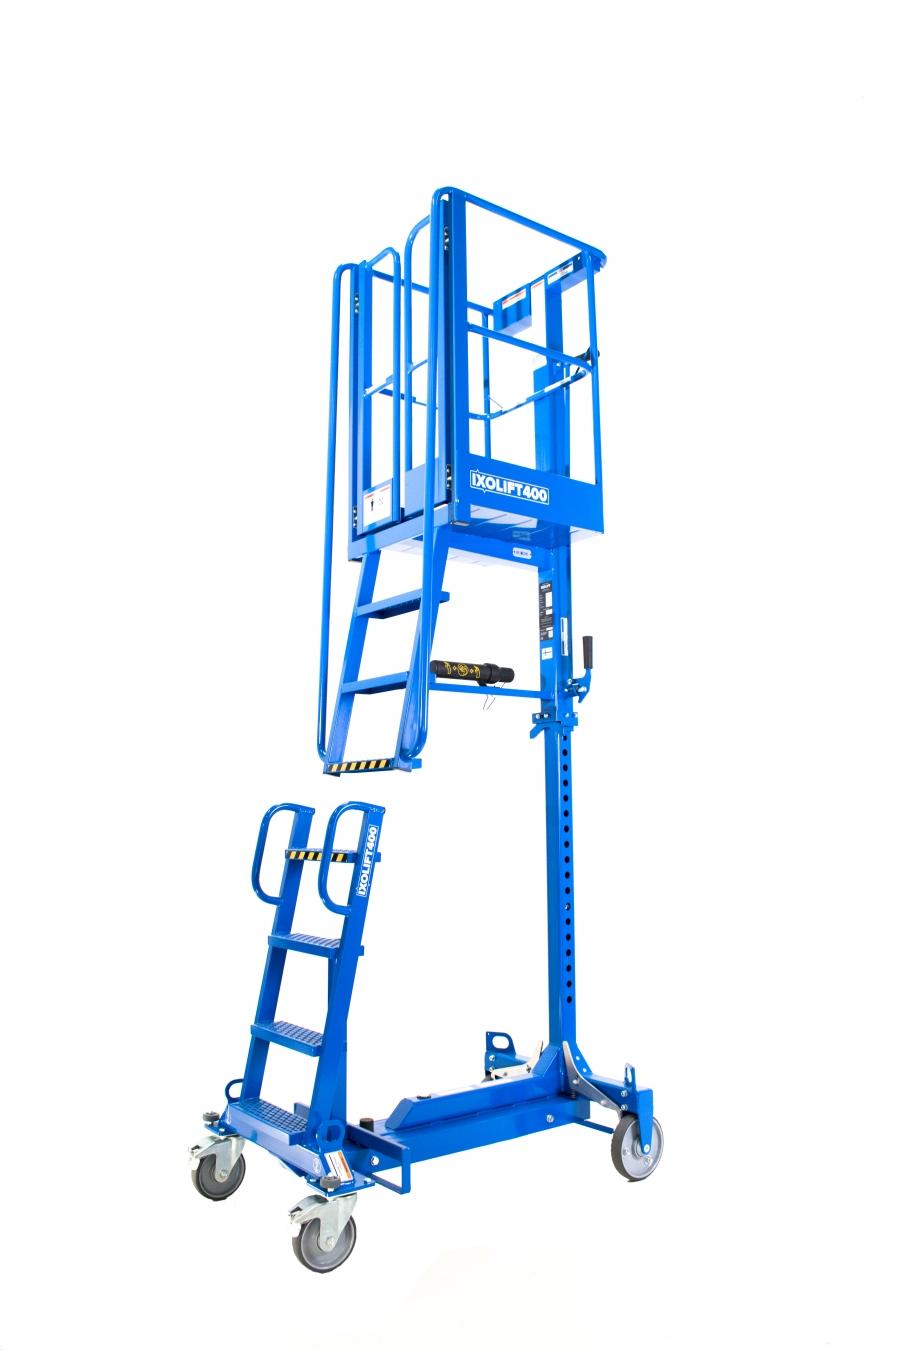 Ixolift 400 WS 01